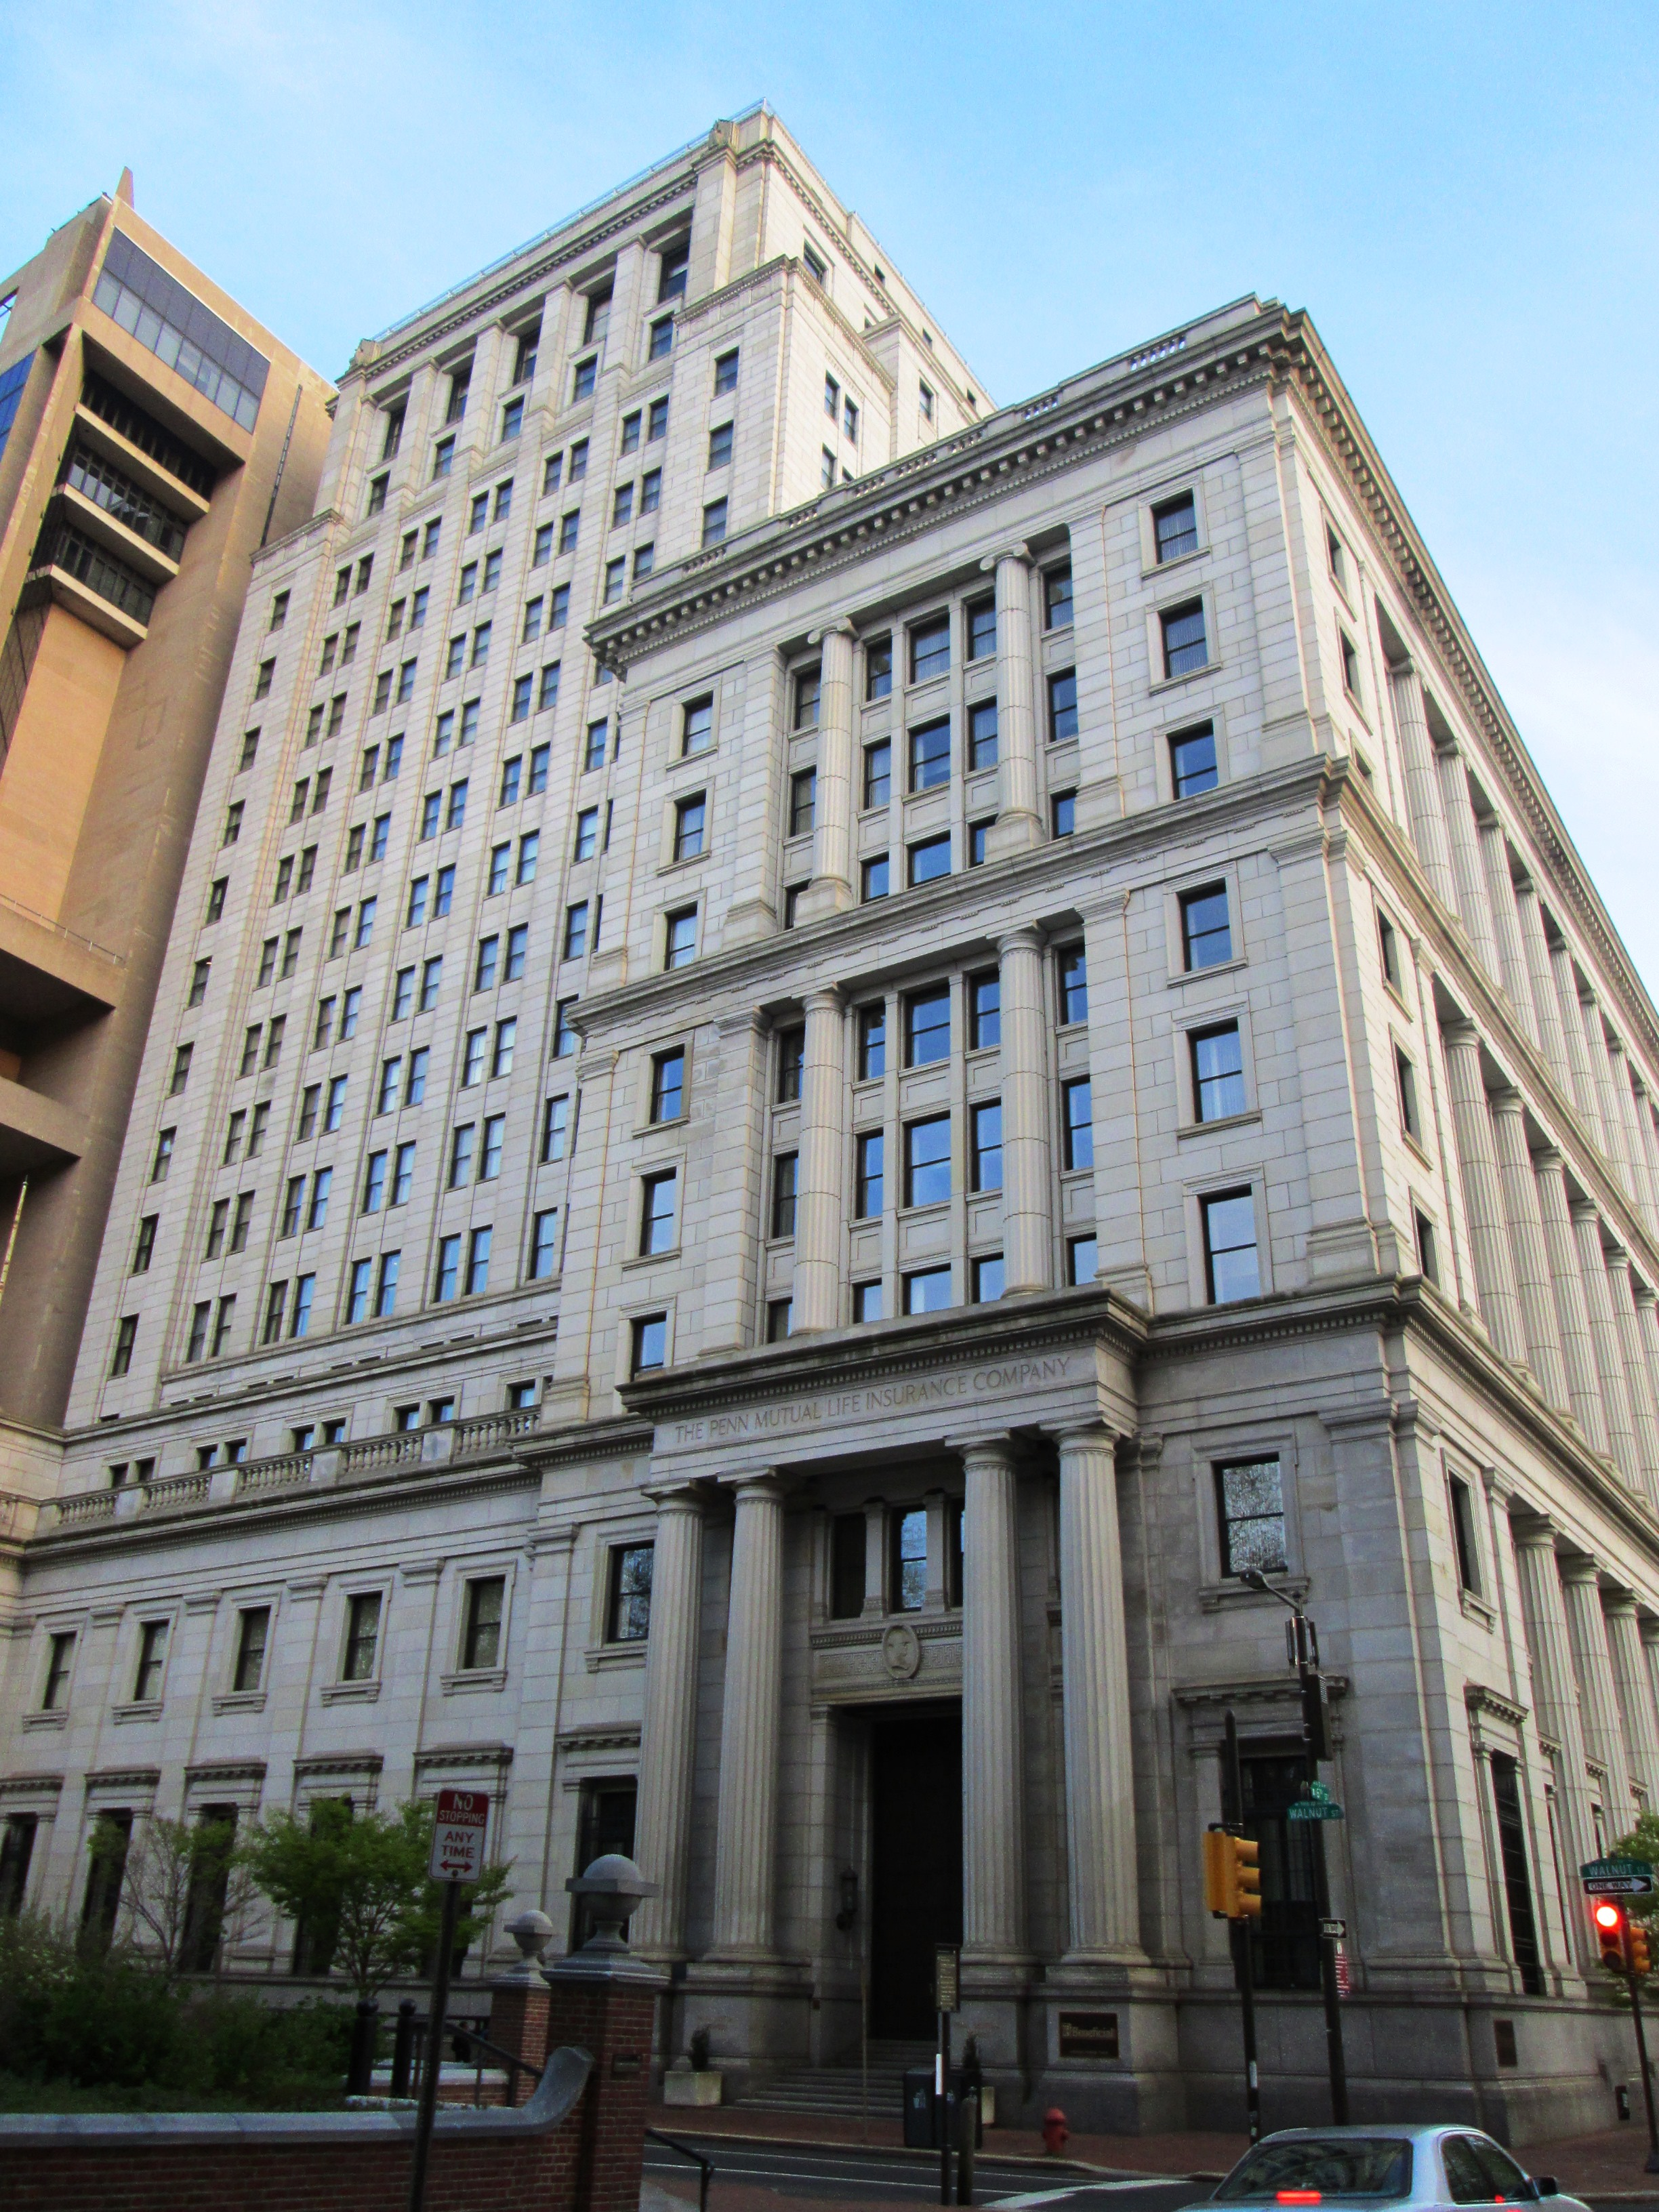 Insurance company life insurance companies philadelphia for House construction insurance